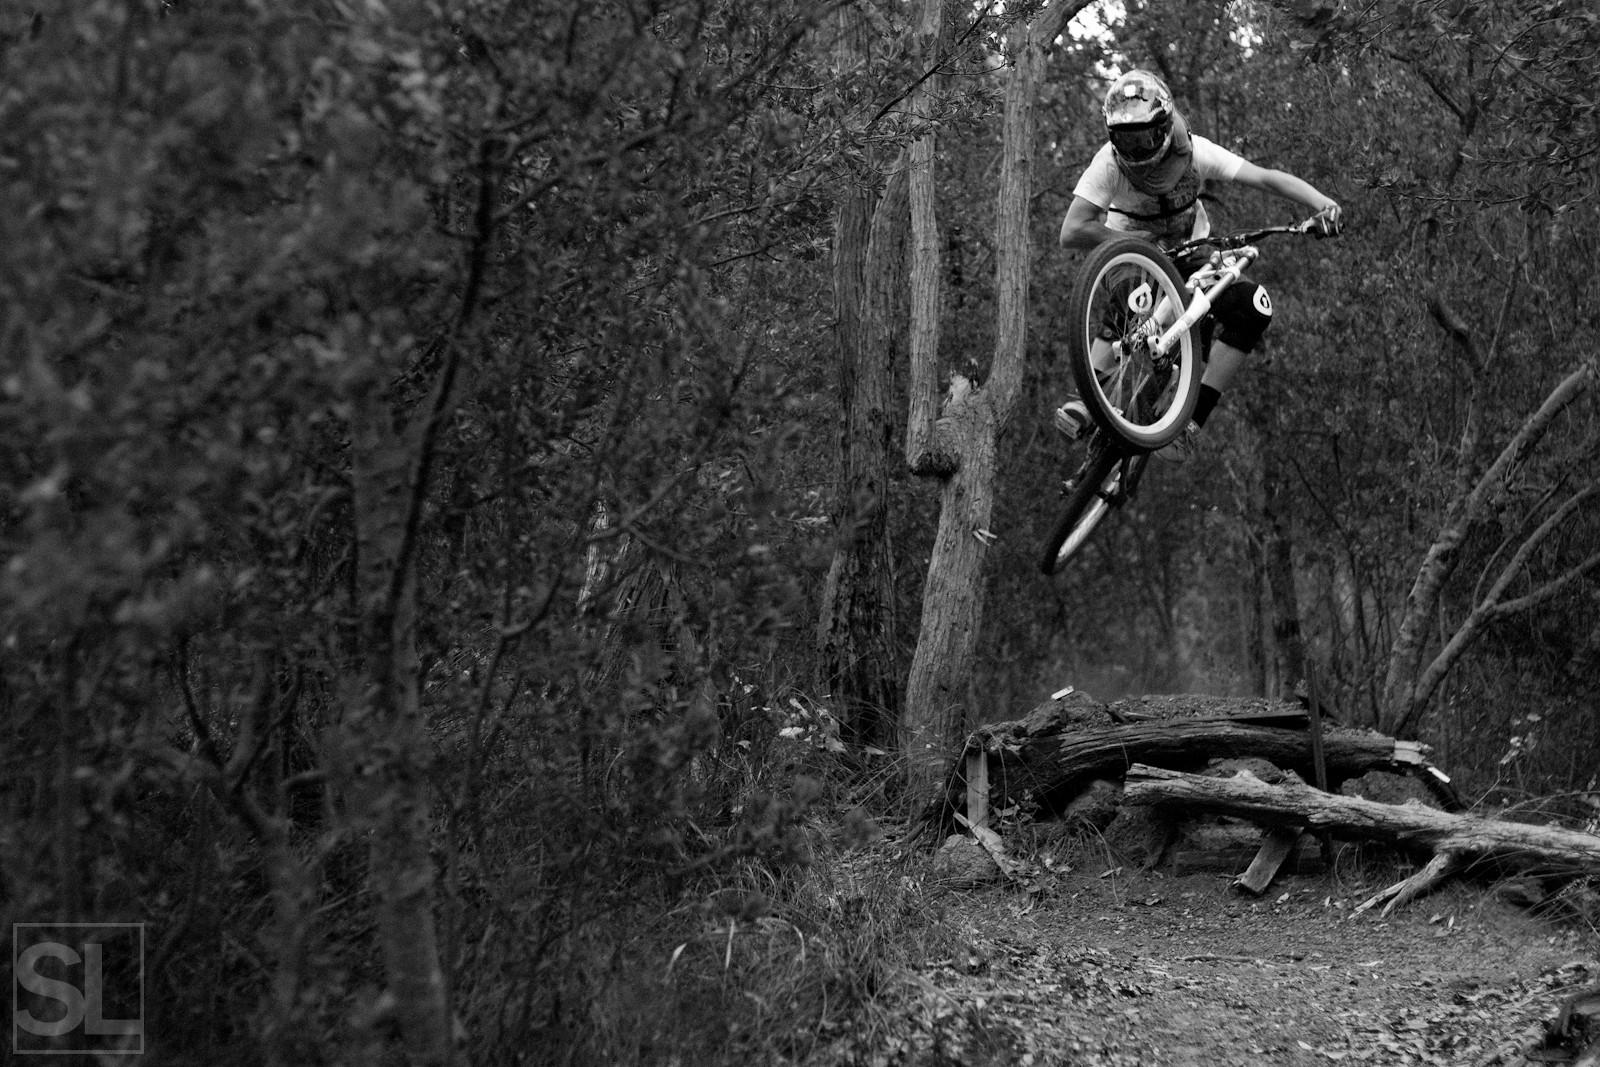 Droppin' Jaeger Bombs! - Chamakazi - Mountain Biking Pictures - Vital MTB